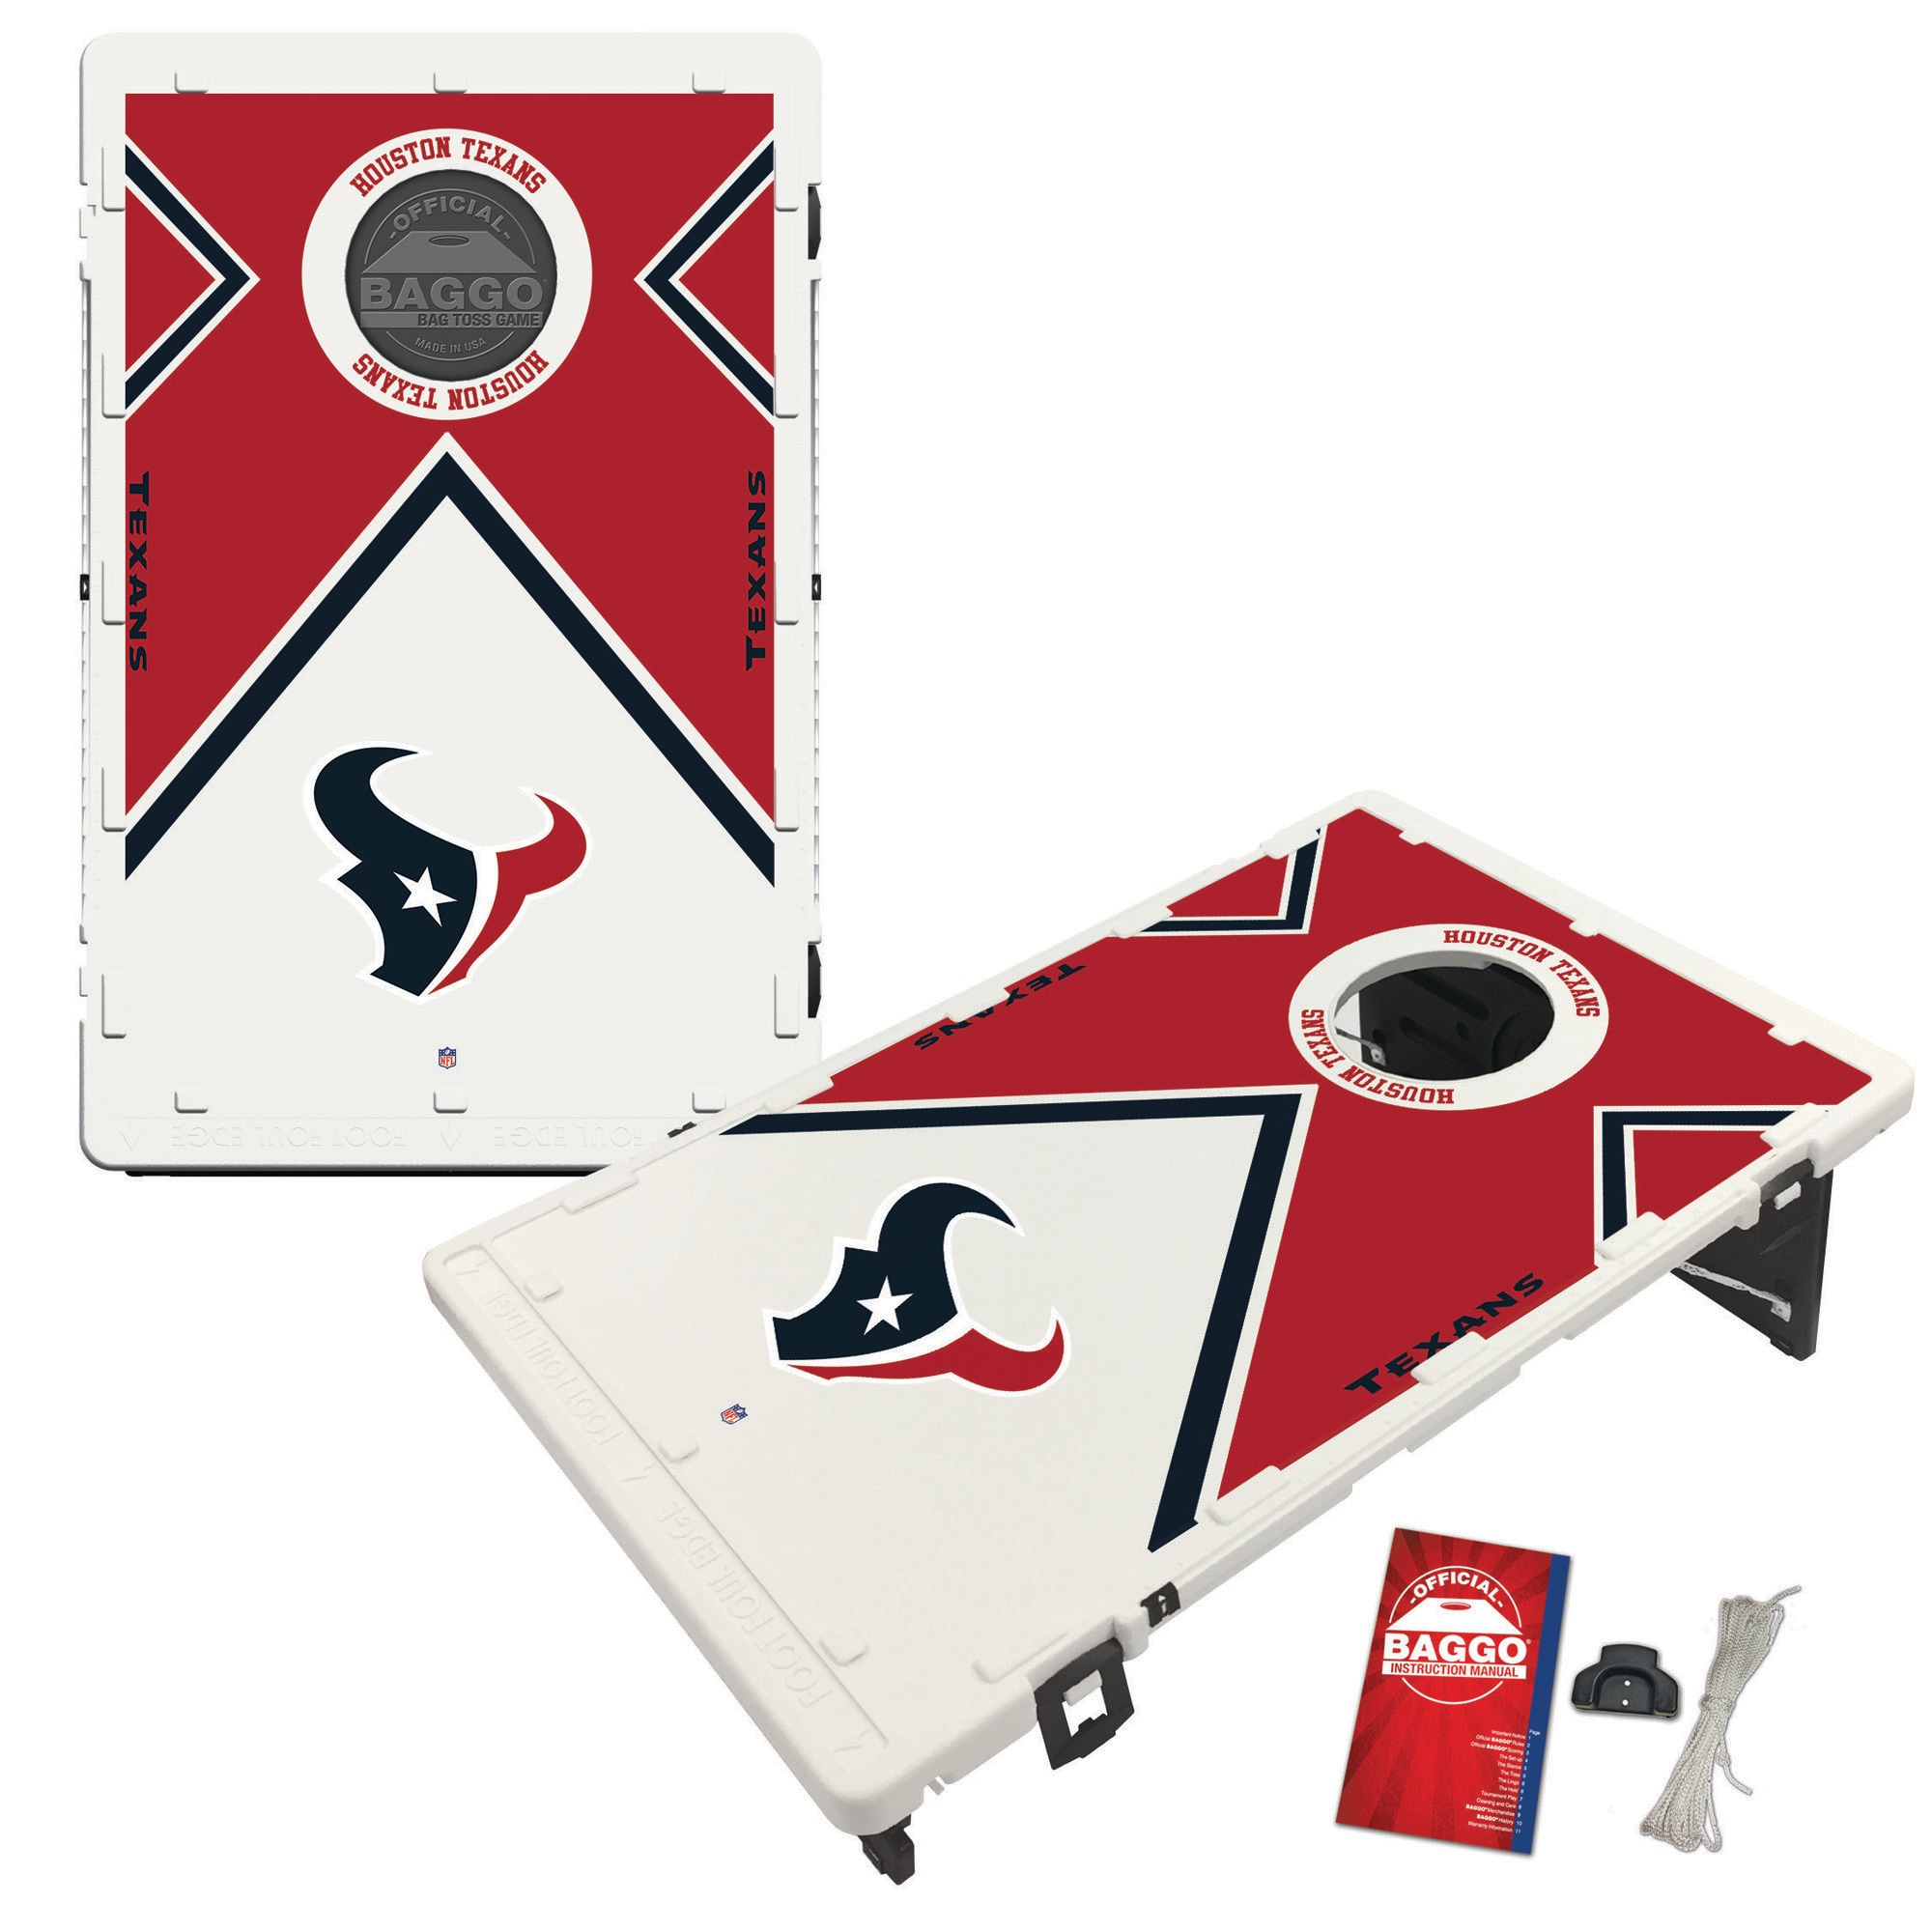 Houston Texans 2' x 3' BAGGO Vintage Cornhole Board Tailgate Toss Set